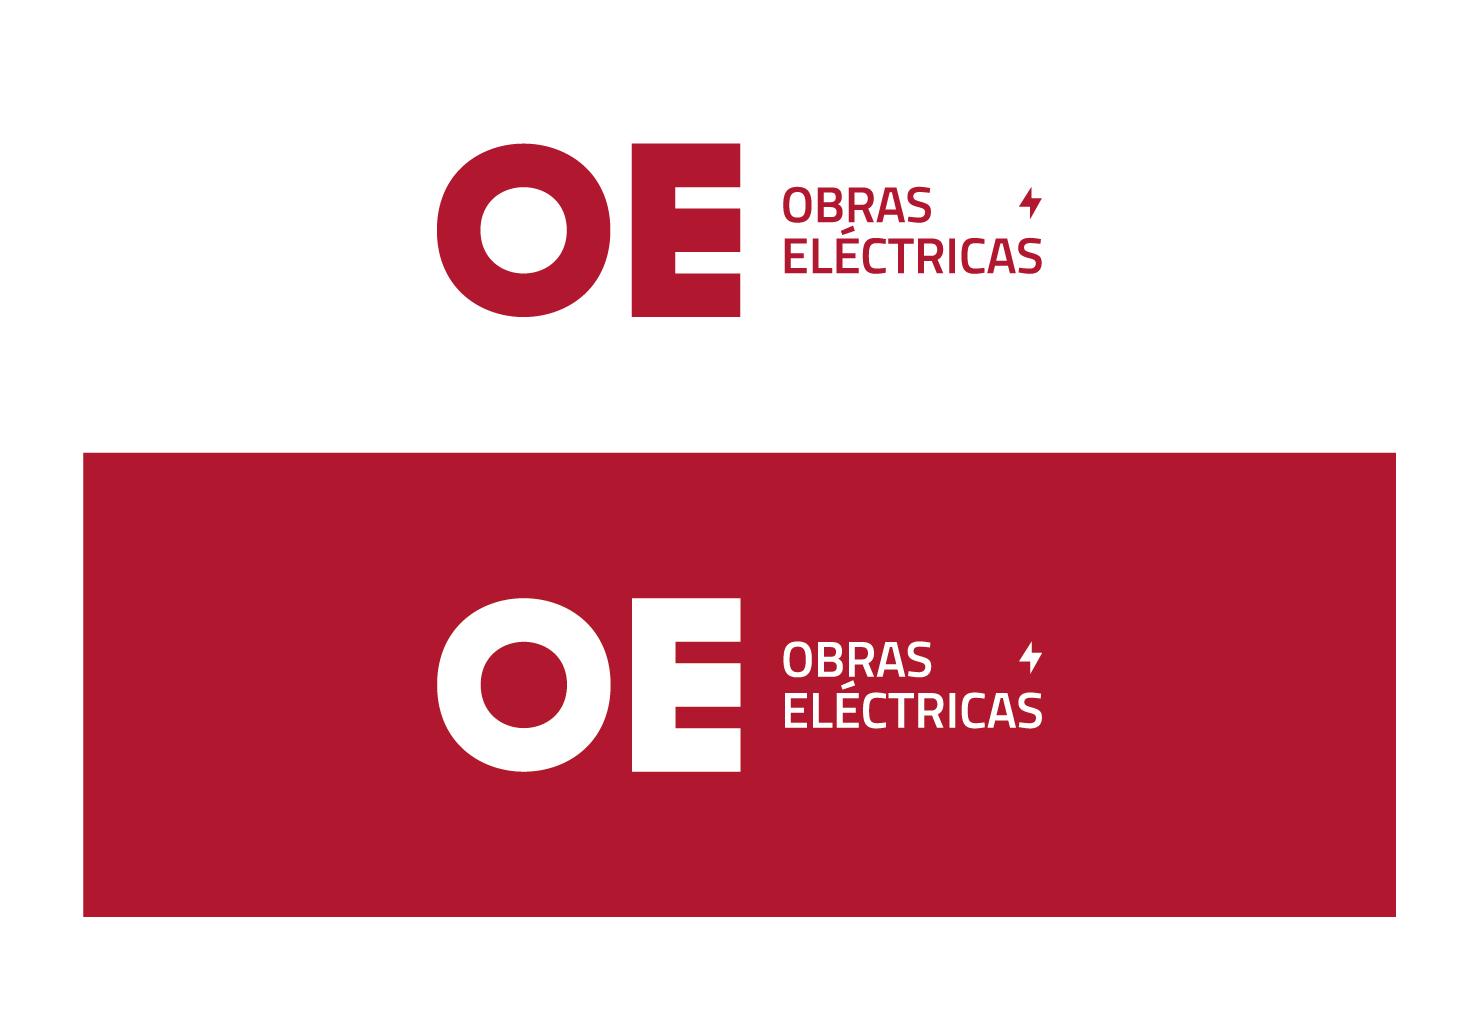 Obras Eléctricas / GRMN Studio